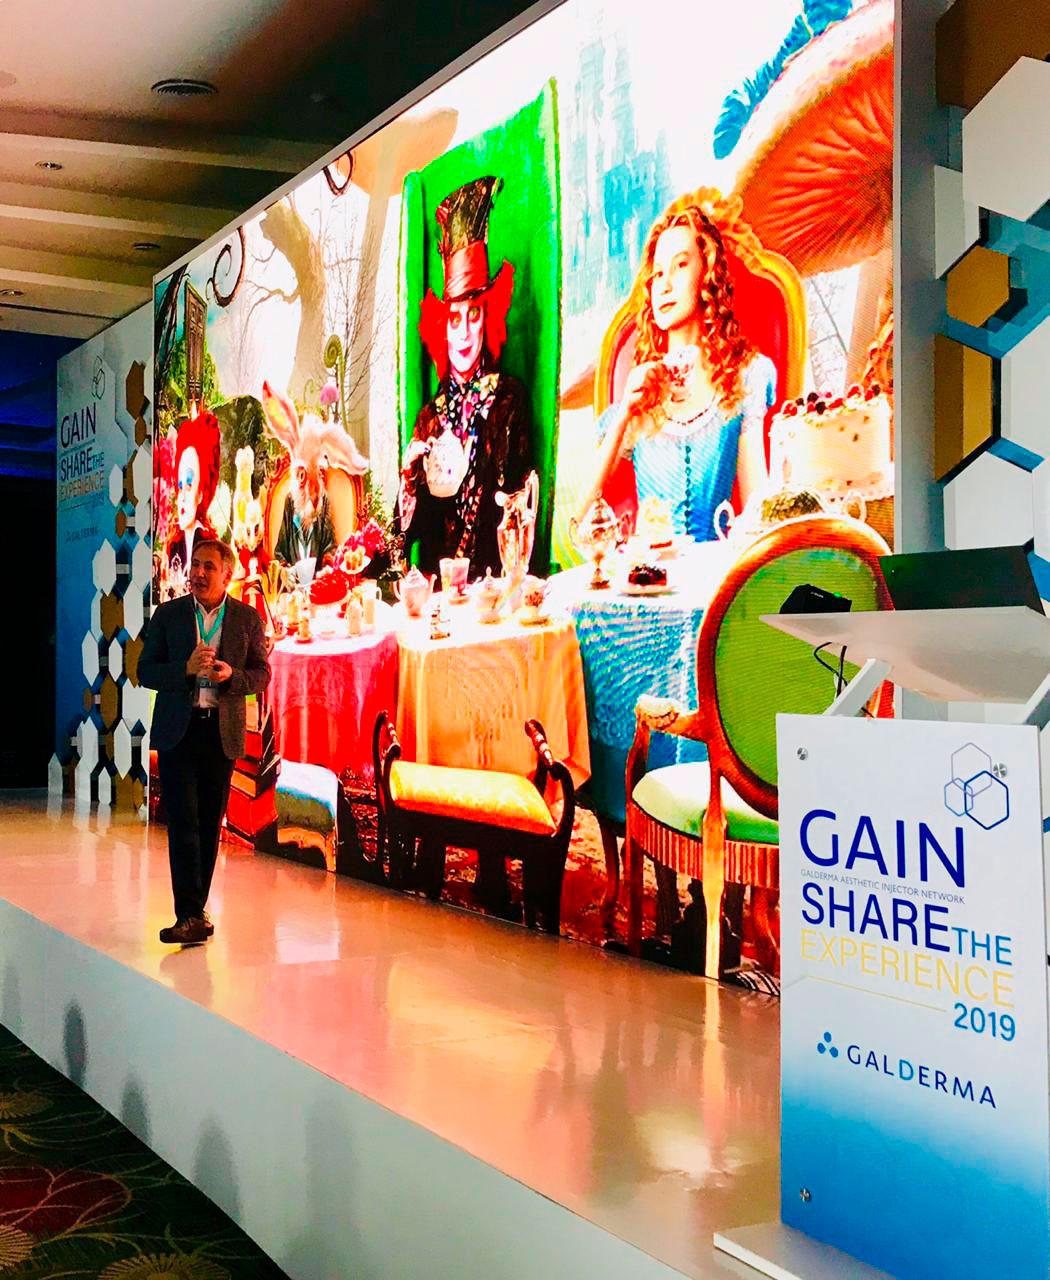 Gain share the experience 2019 Galderma Aesthetics Dr. Frank Rosengaus